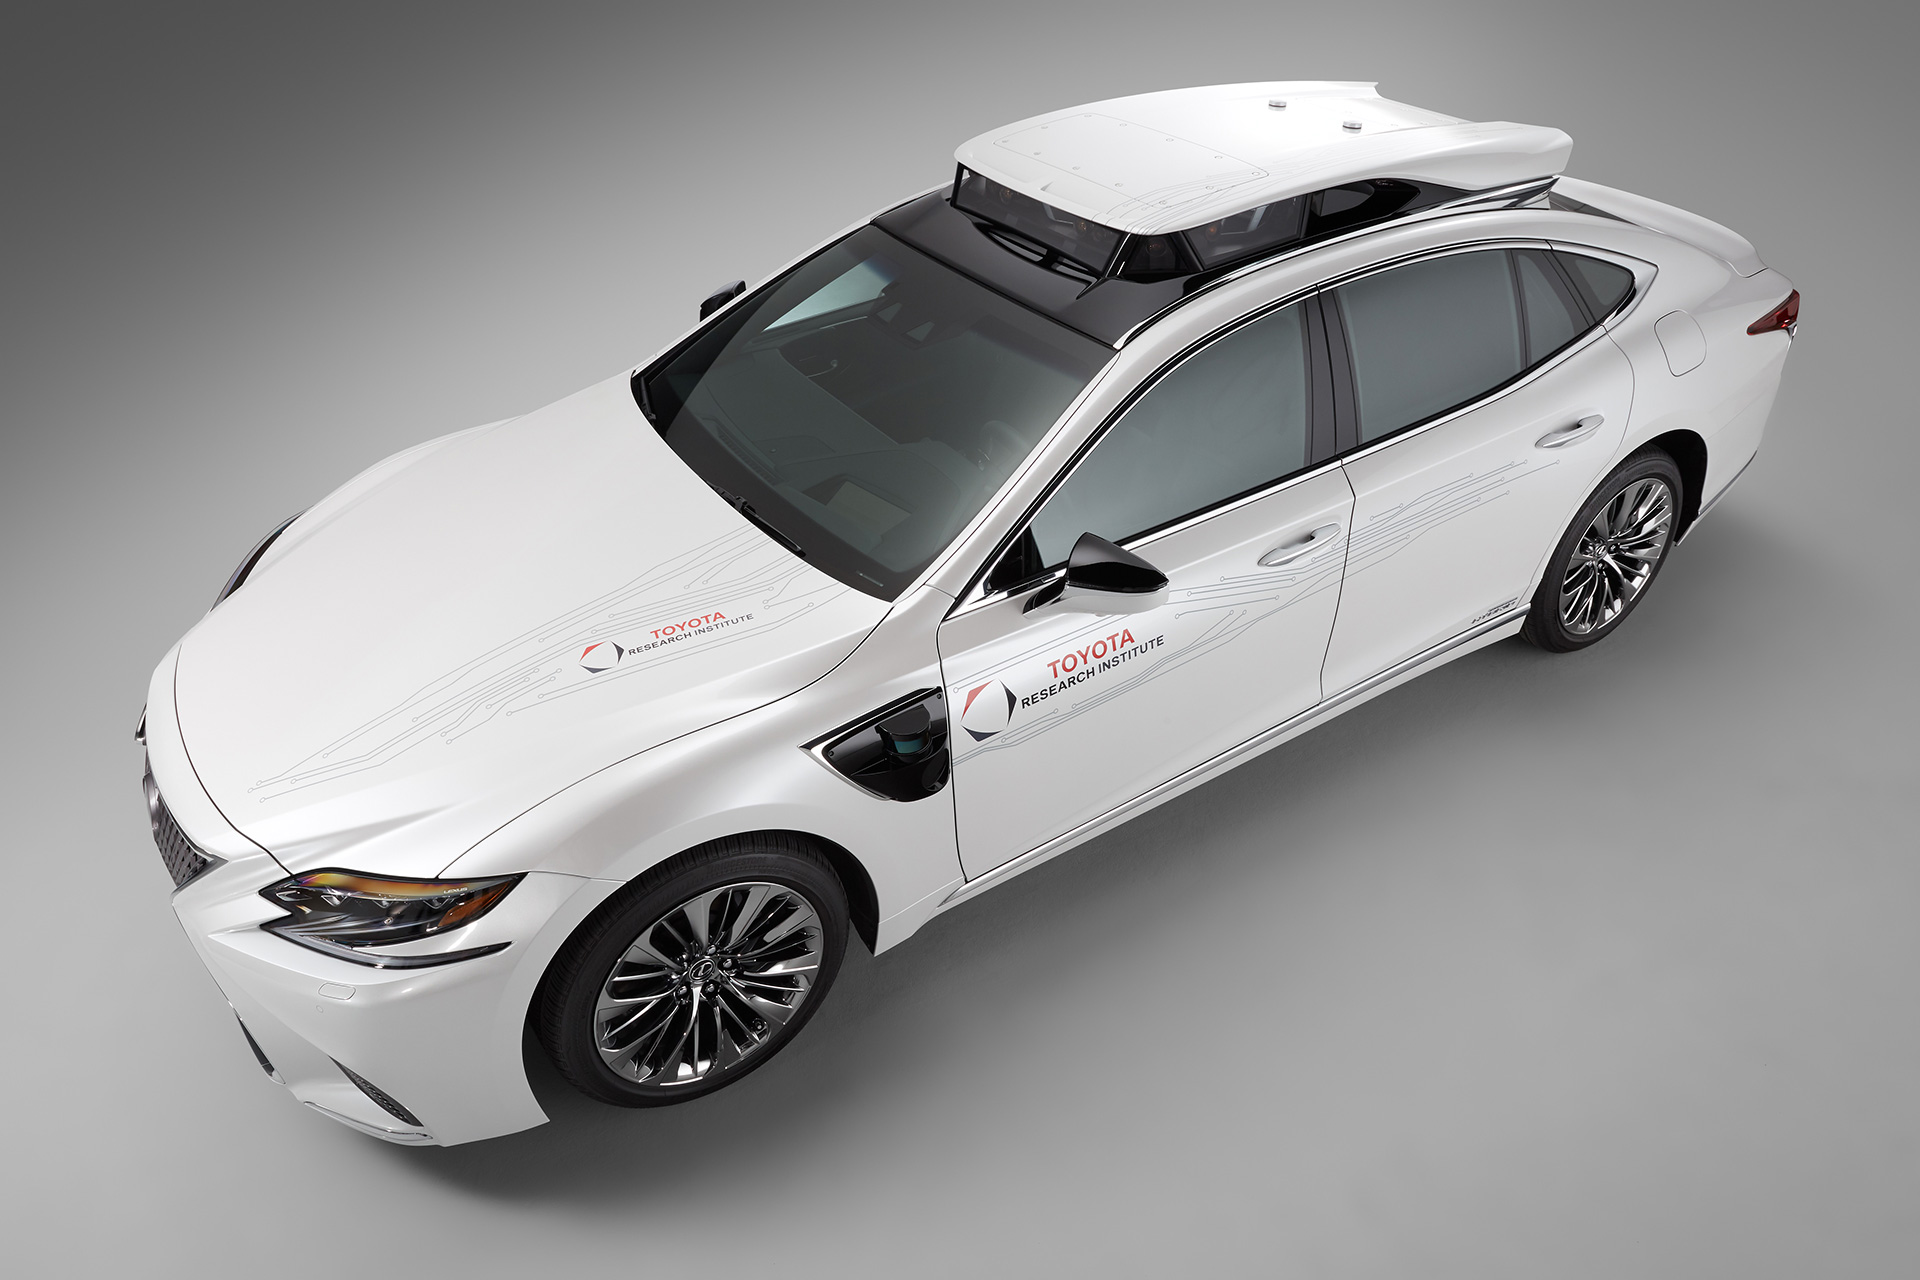 「【CES 2019】新型レクサスLSをベースとした自動運転実験車「TRI-P4」を披露」の16枚目の画像